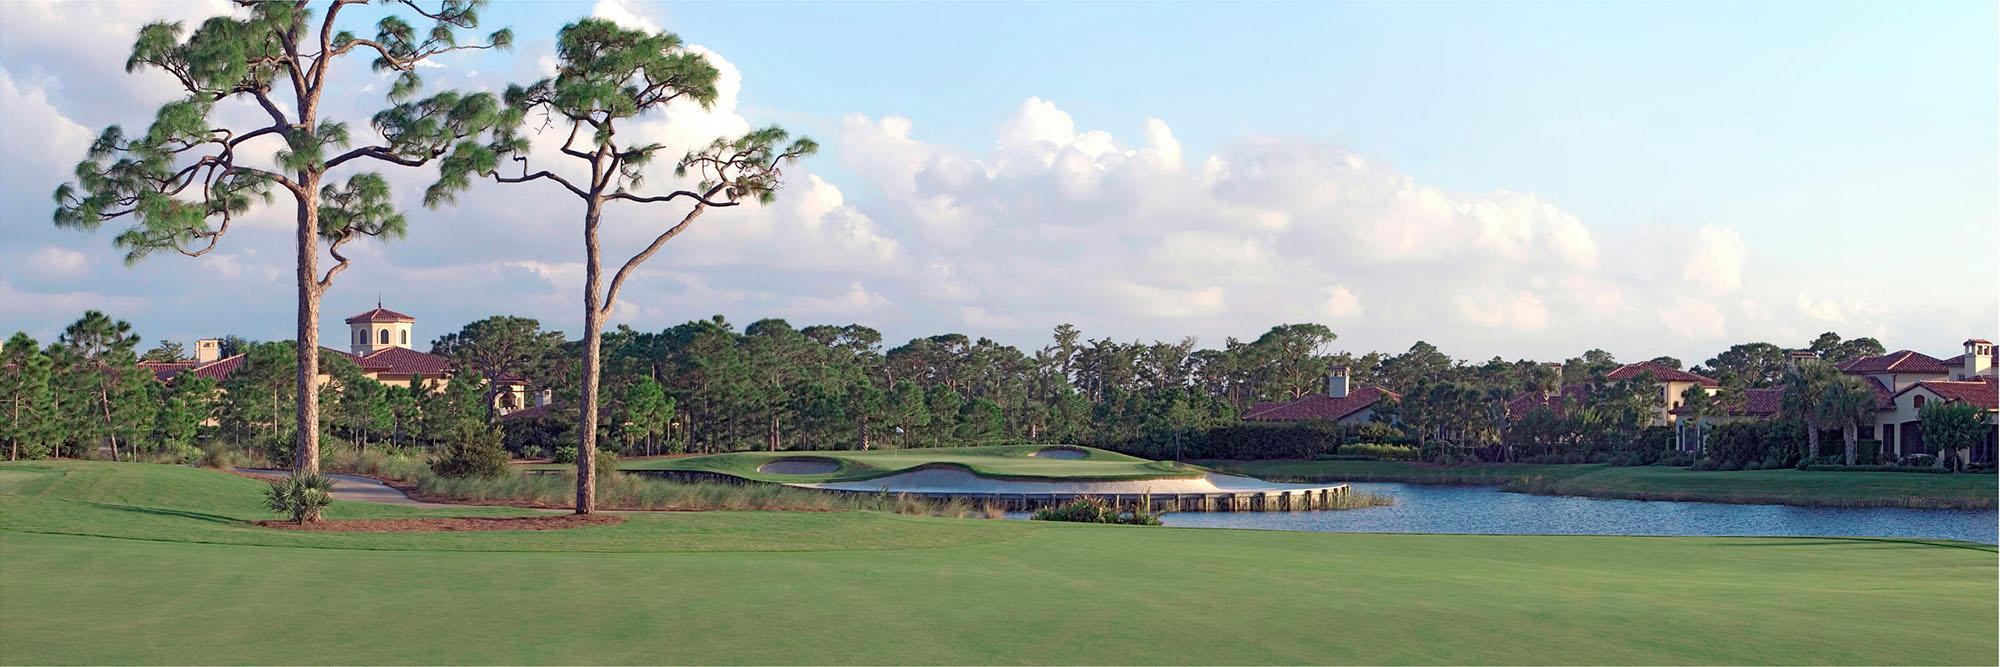 Golf Course Image - Ritz Carlton Jupiter No. 9